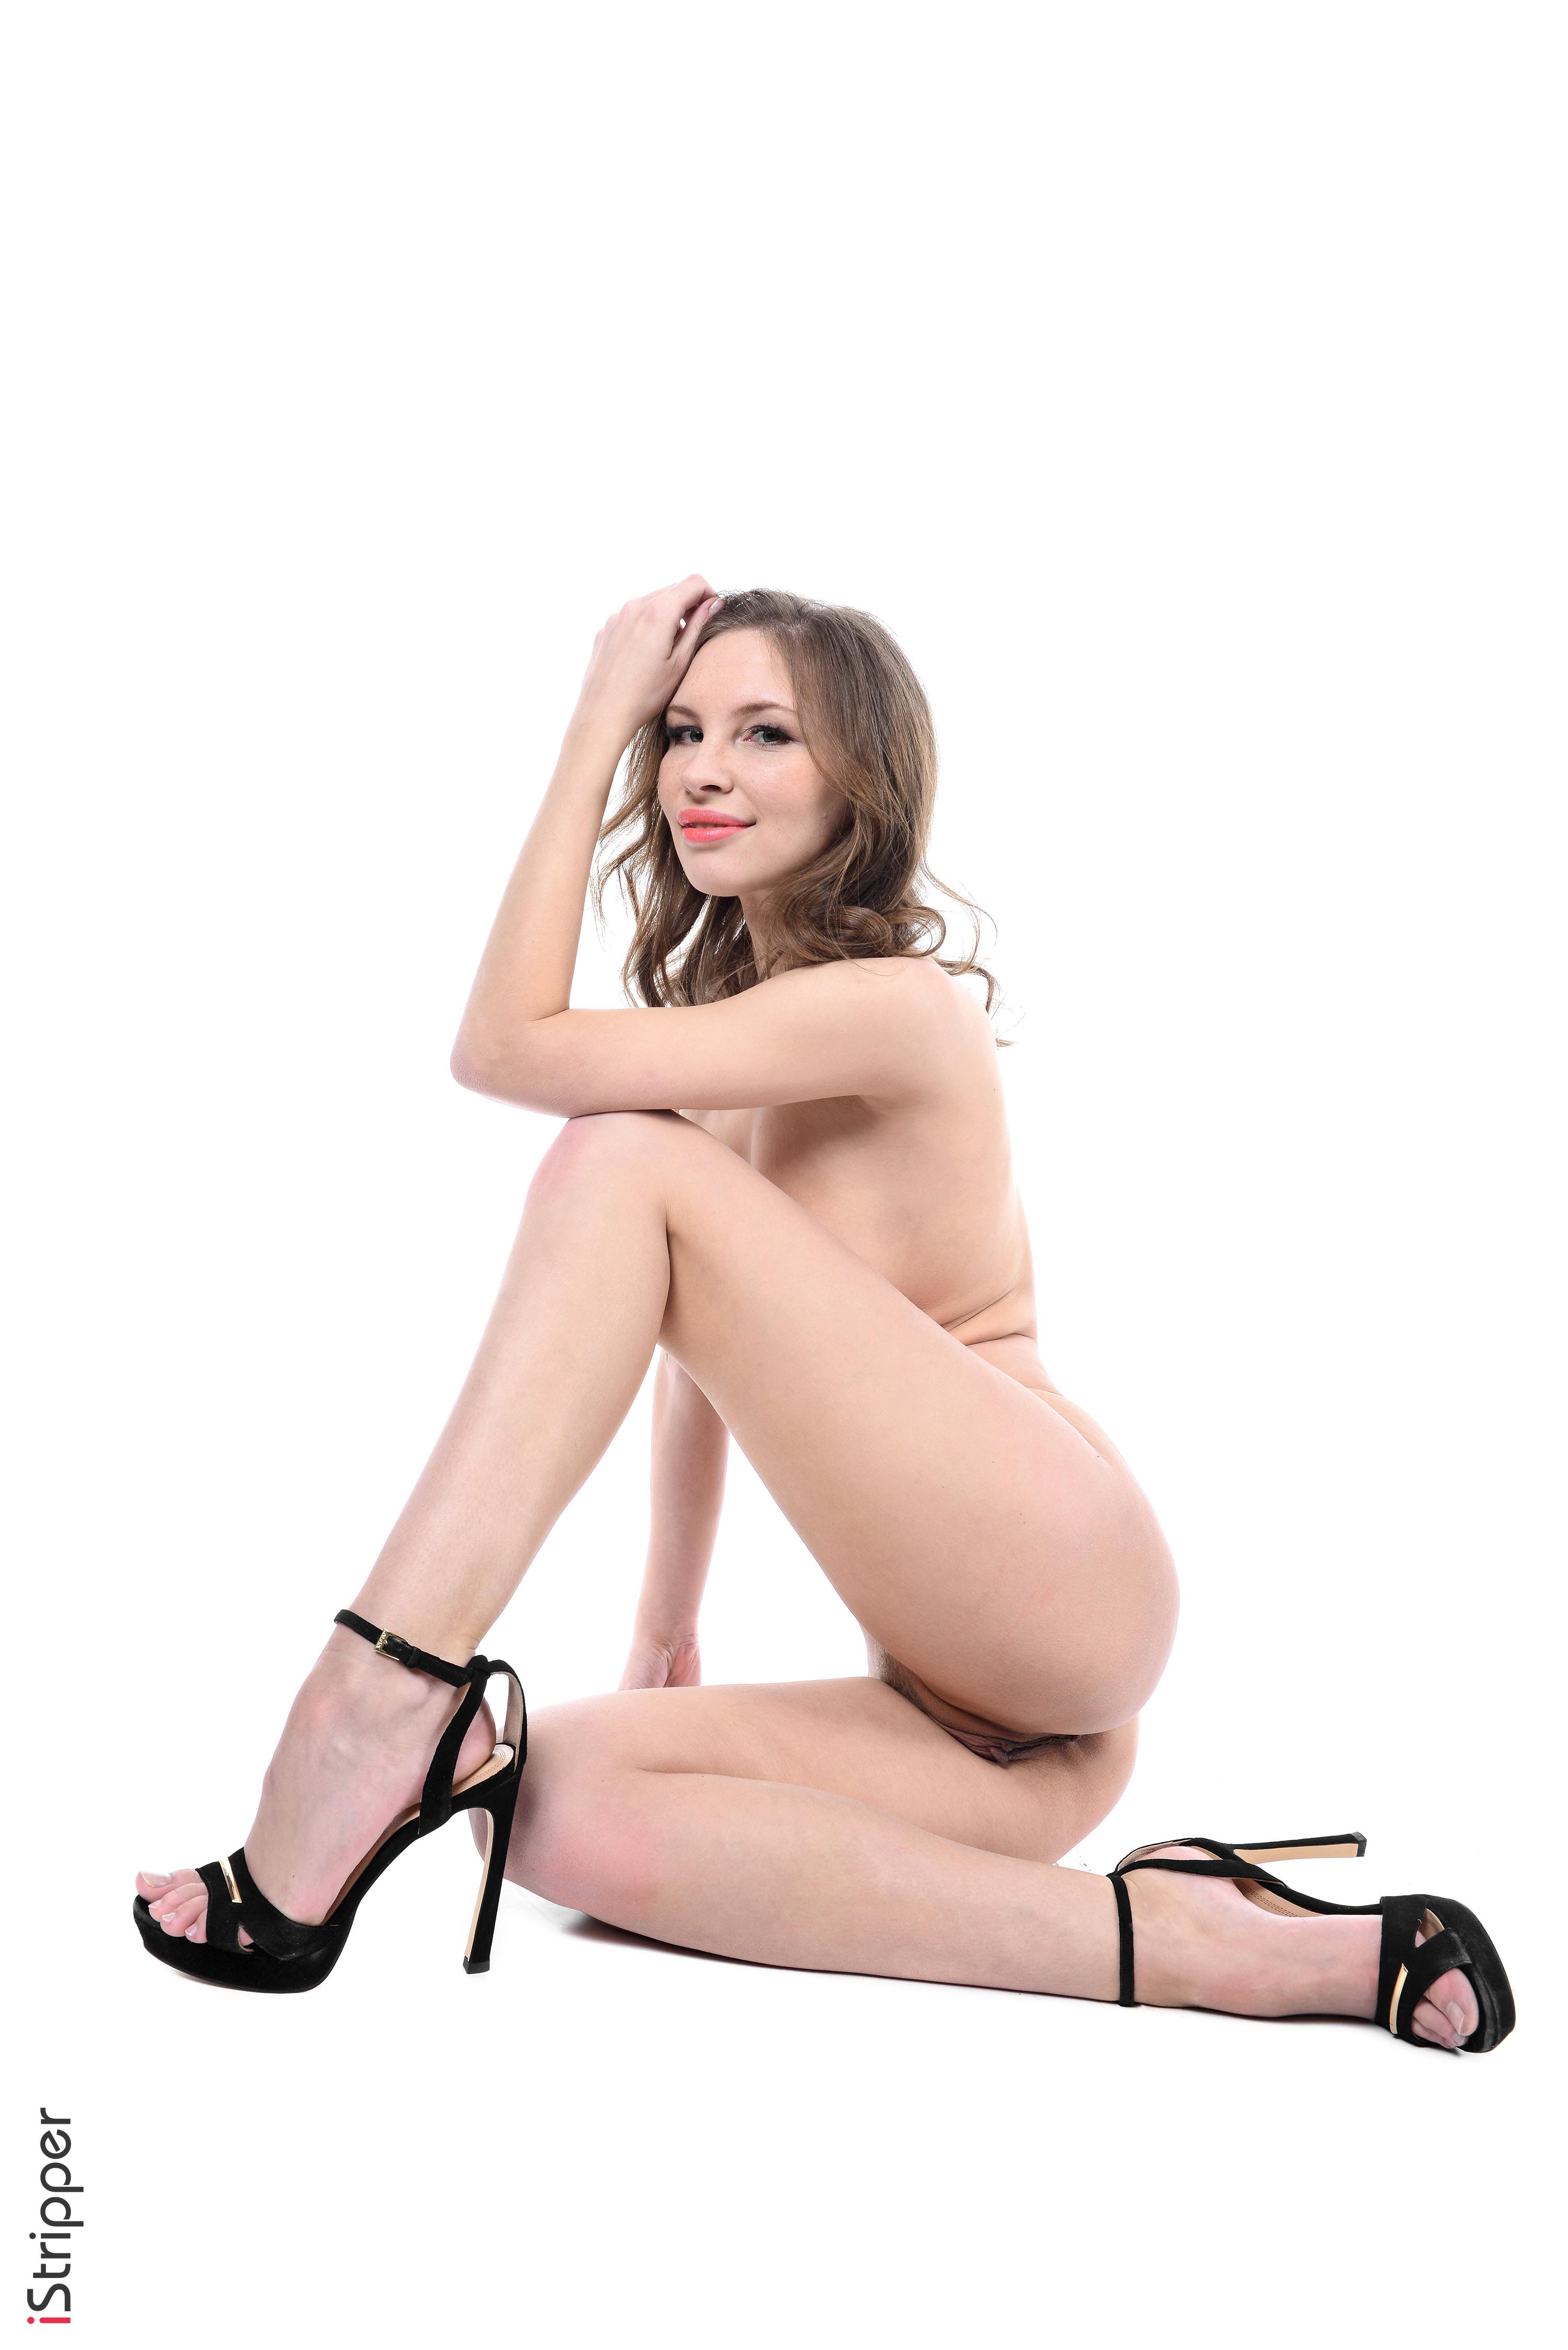 girls stripping on your desktop